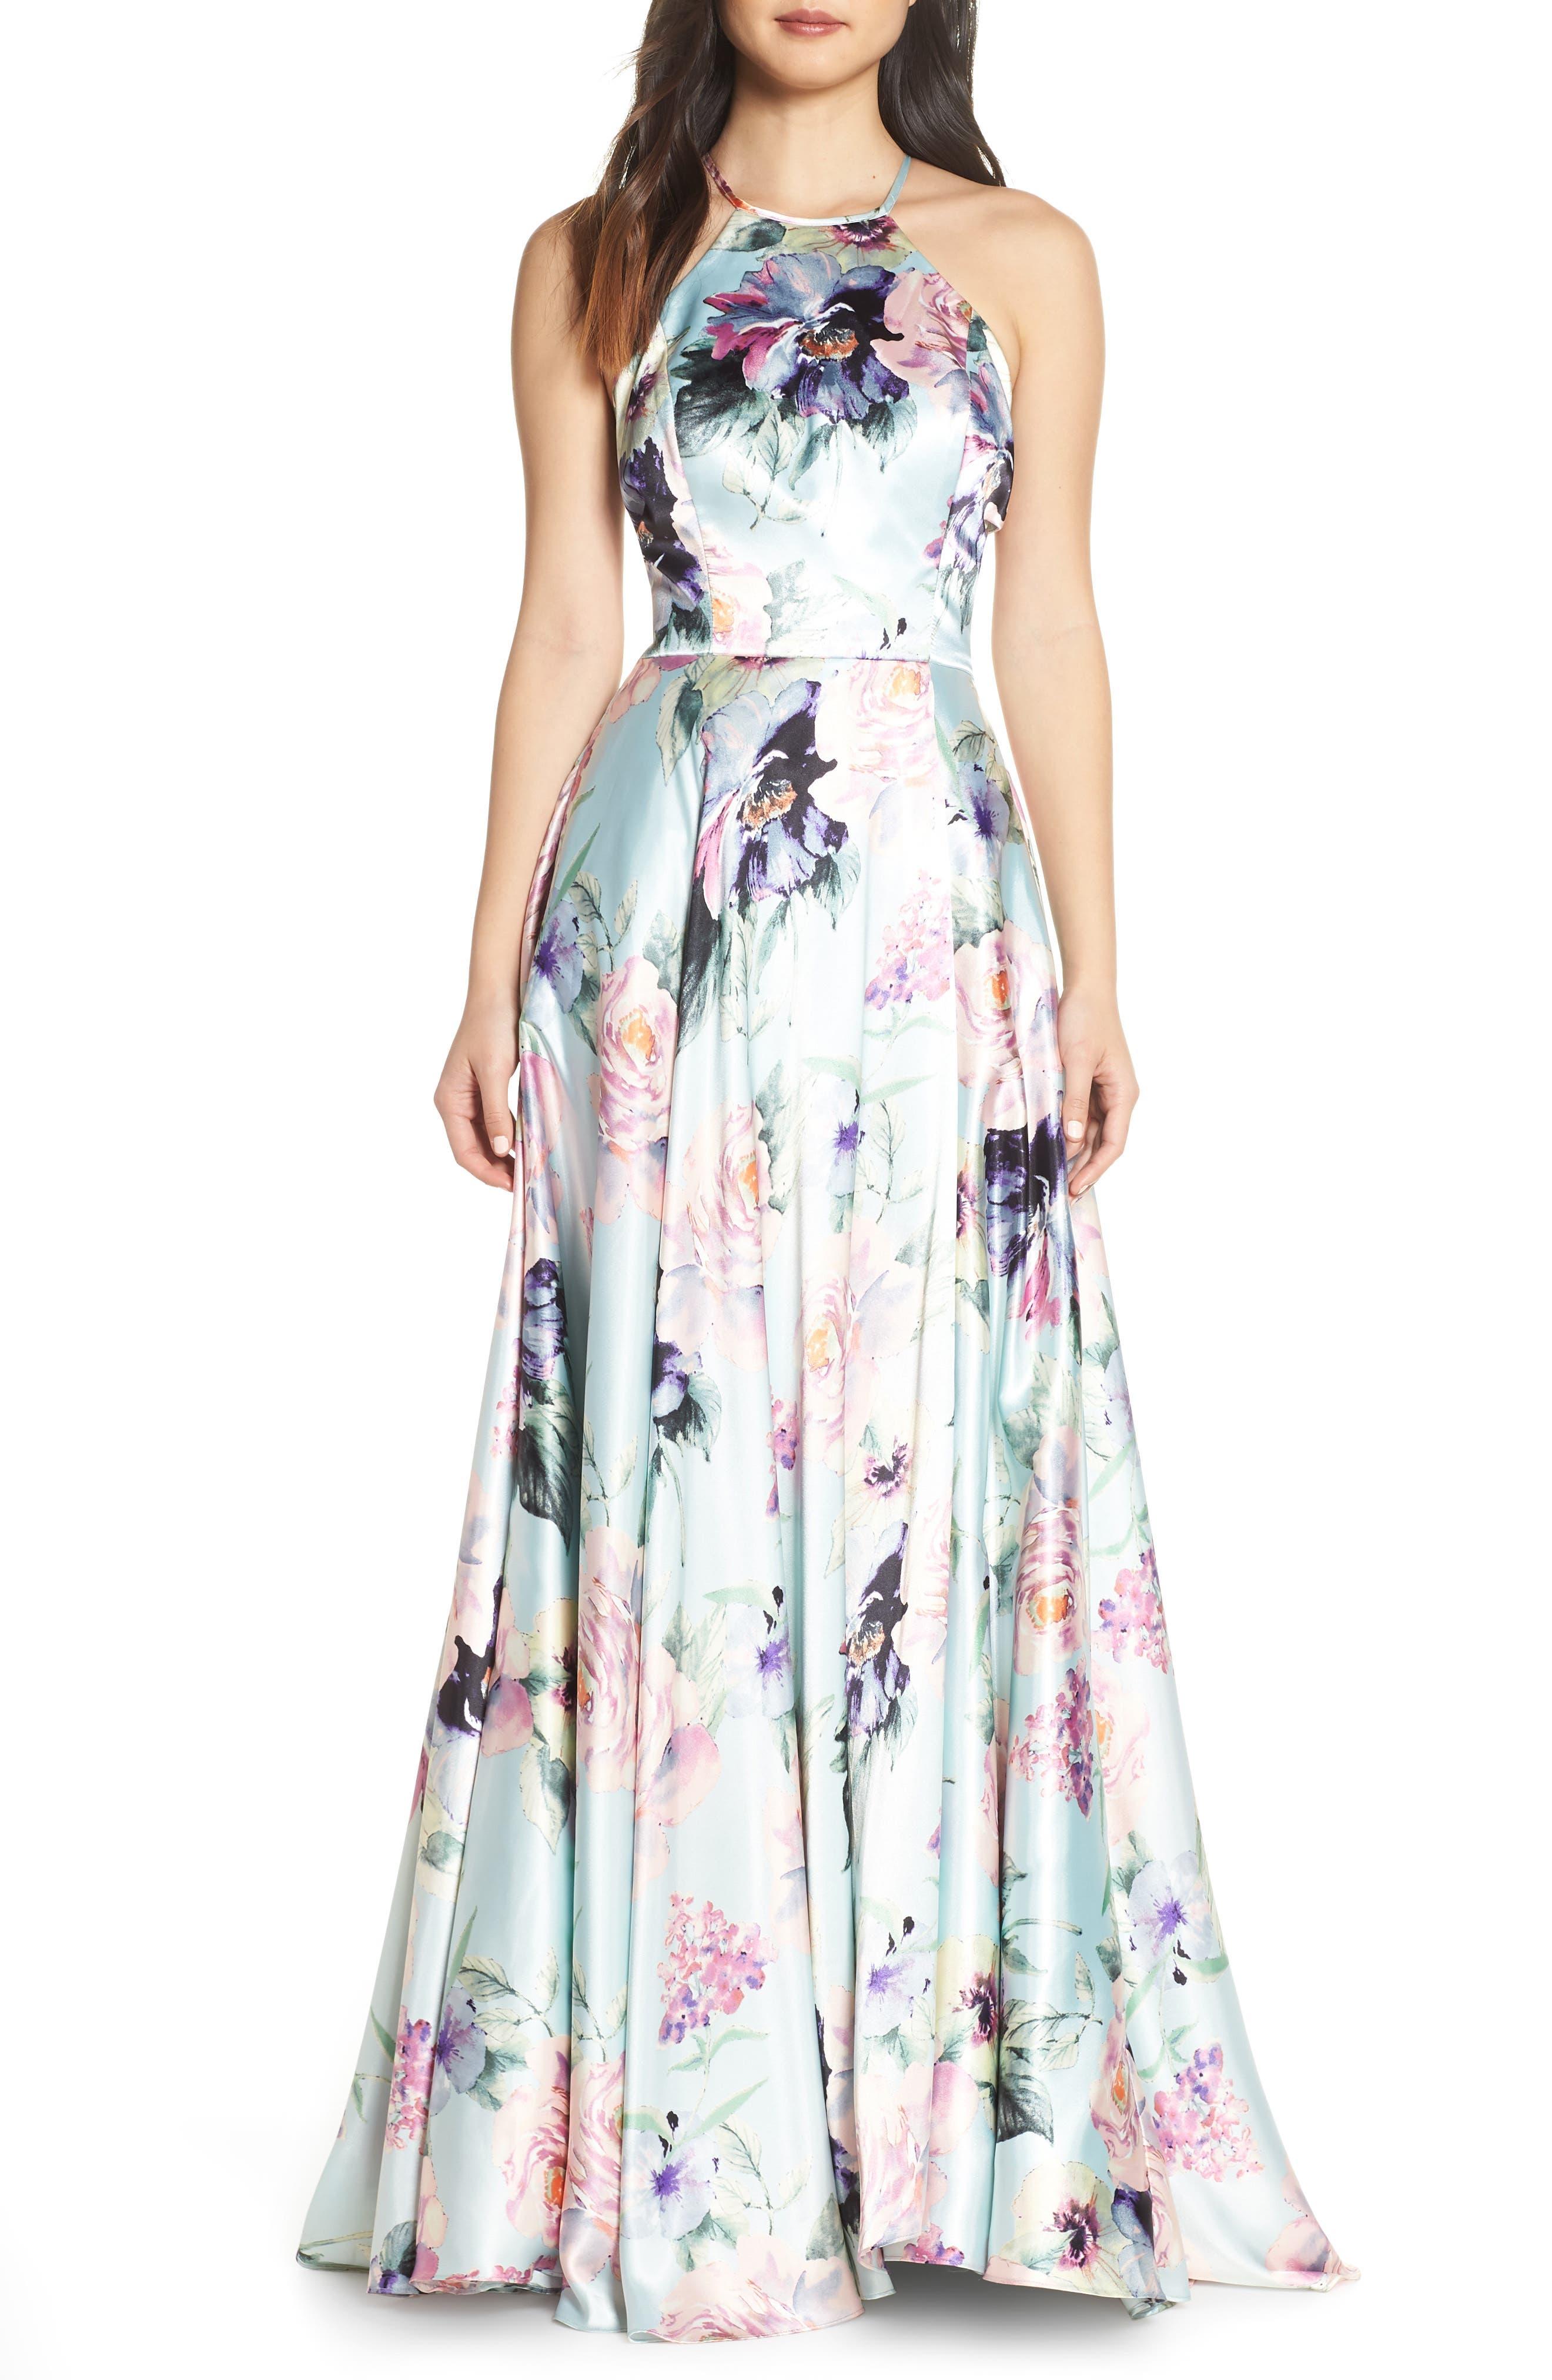 Blondie Nites Floral Print Charmeuse Evening Dress, Green